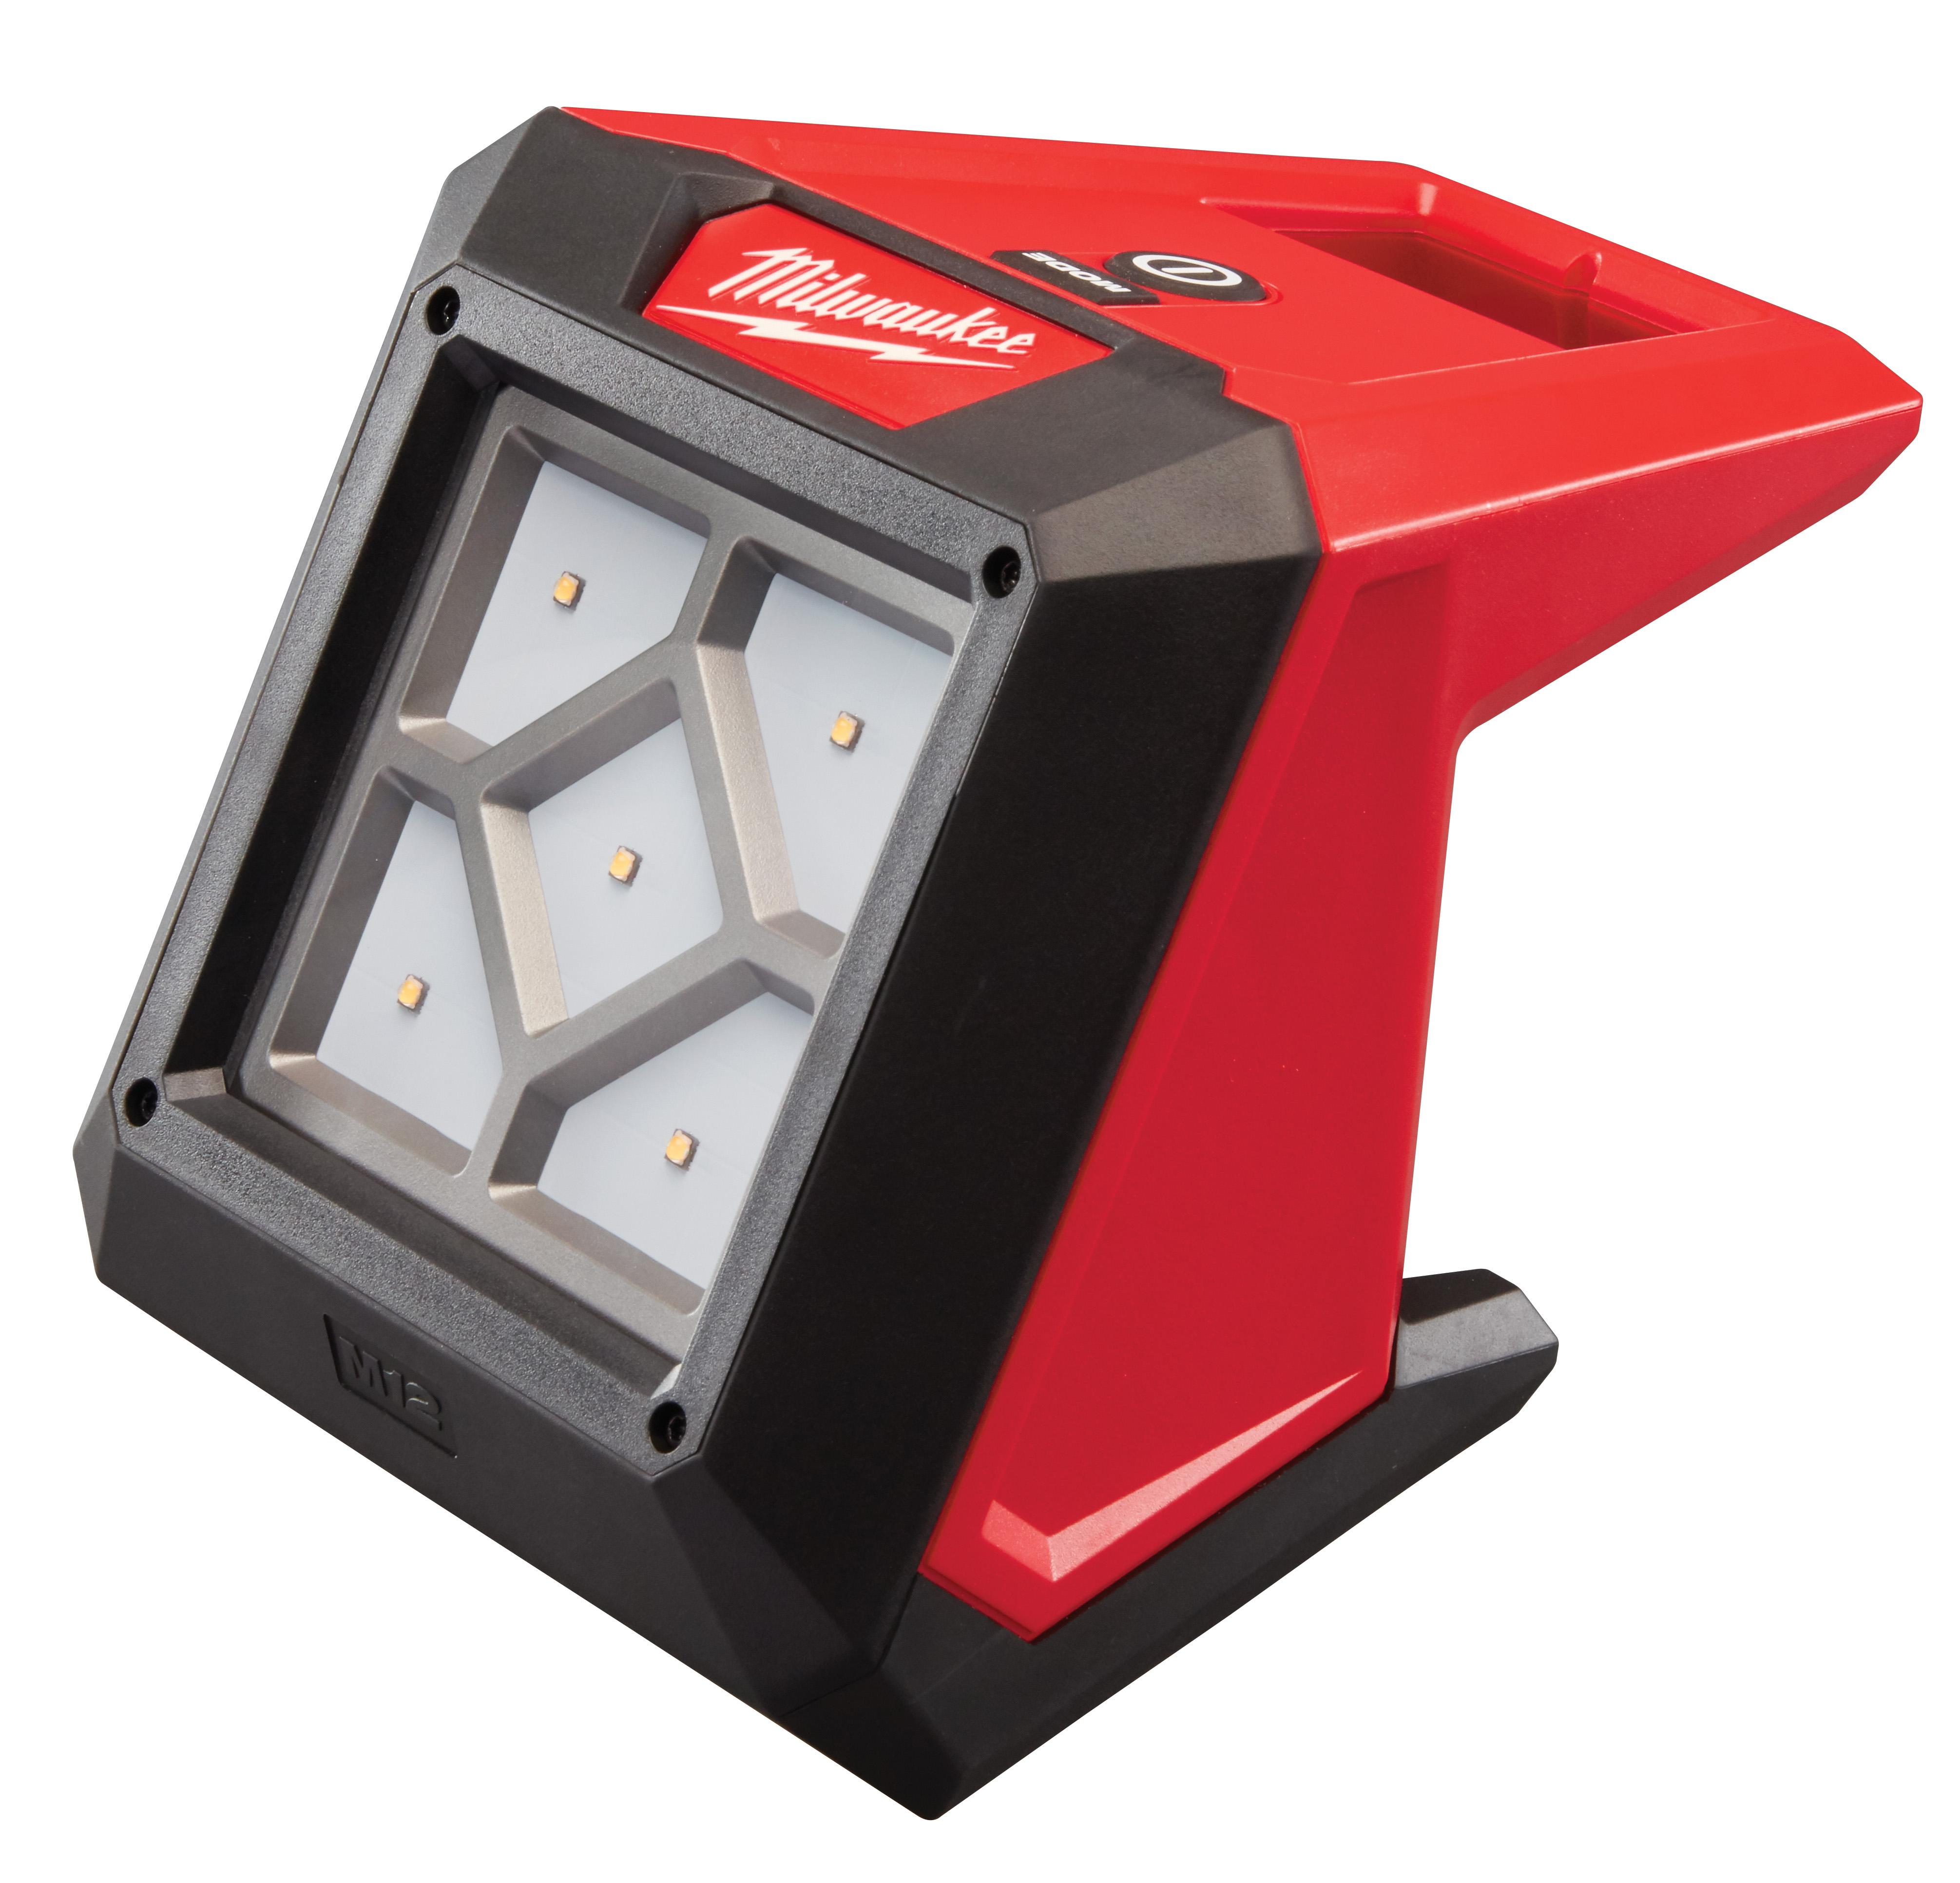 Milwaukee® M12™ 2364-20 Compact Flood Light, LED Lamp, 12 VDC, Lithium-Ion Battery